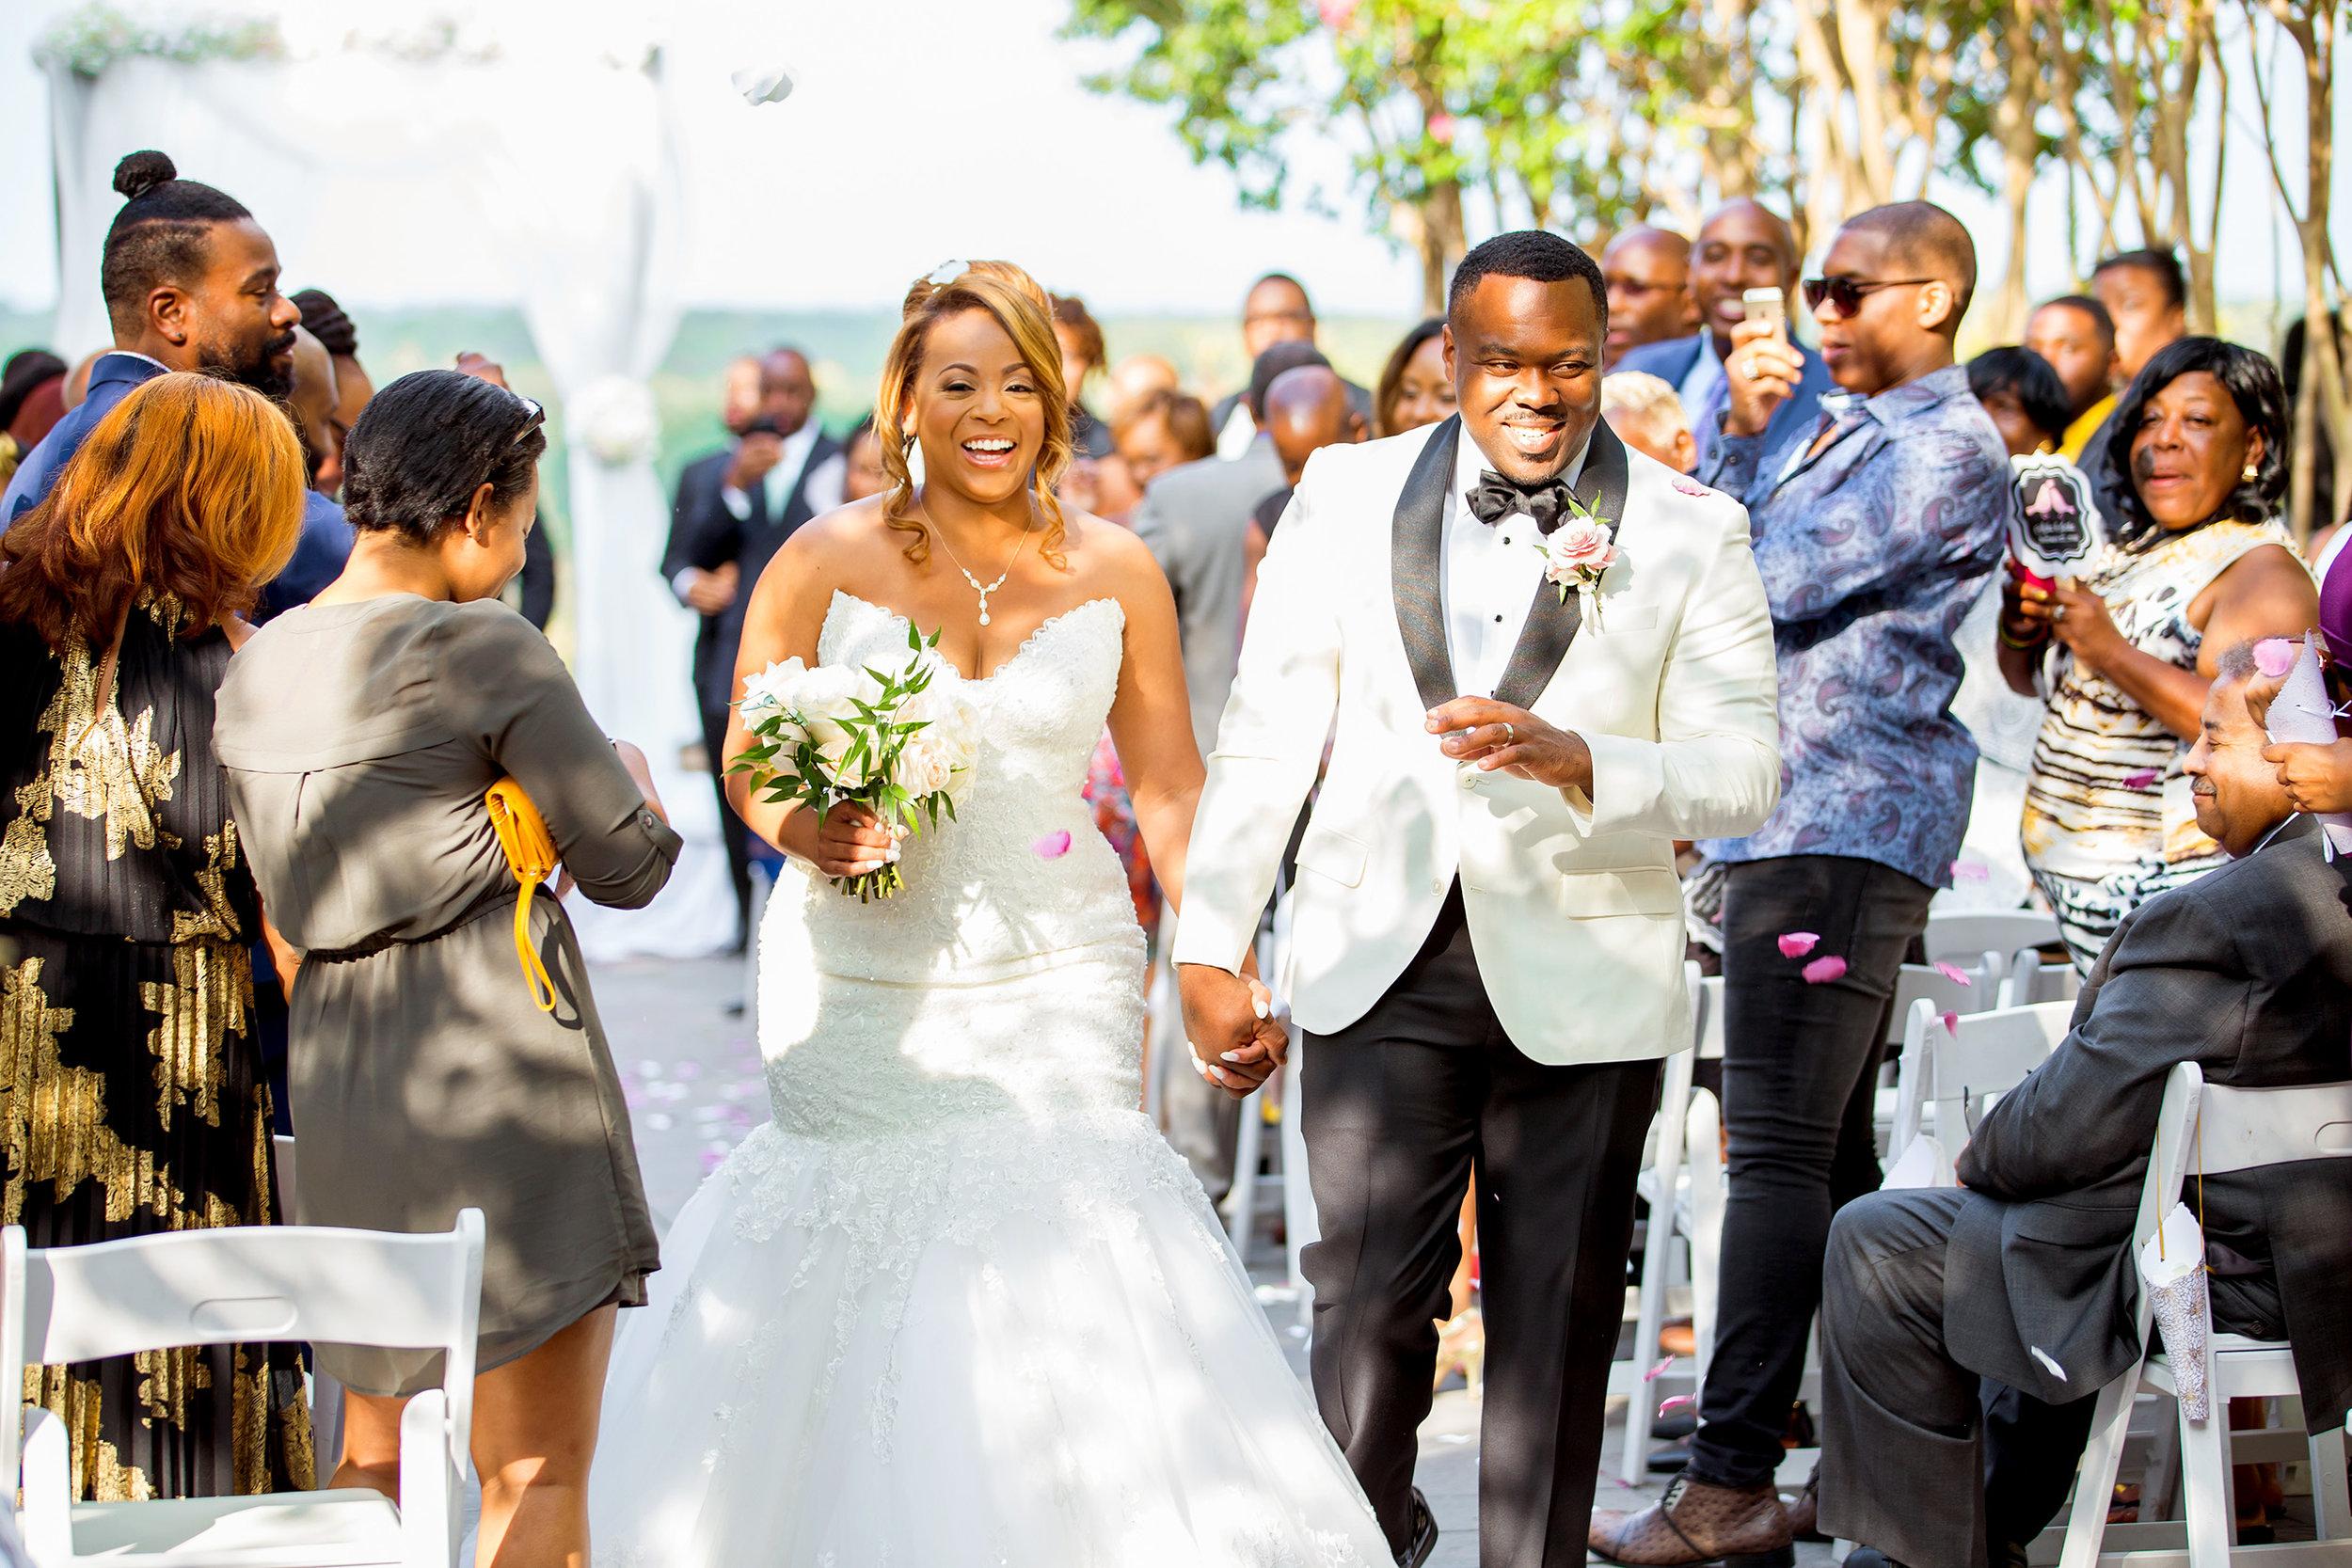 Lansdowne Resort and Spa wedding photos as seen on Essence by Jessica Nazarova